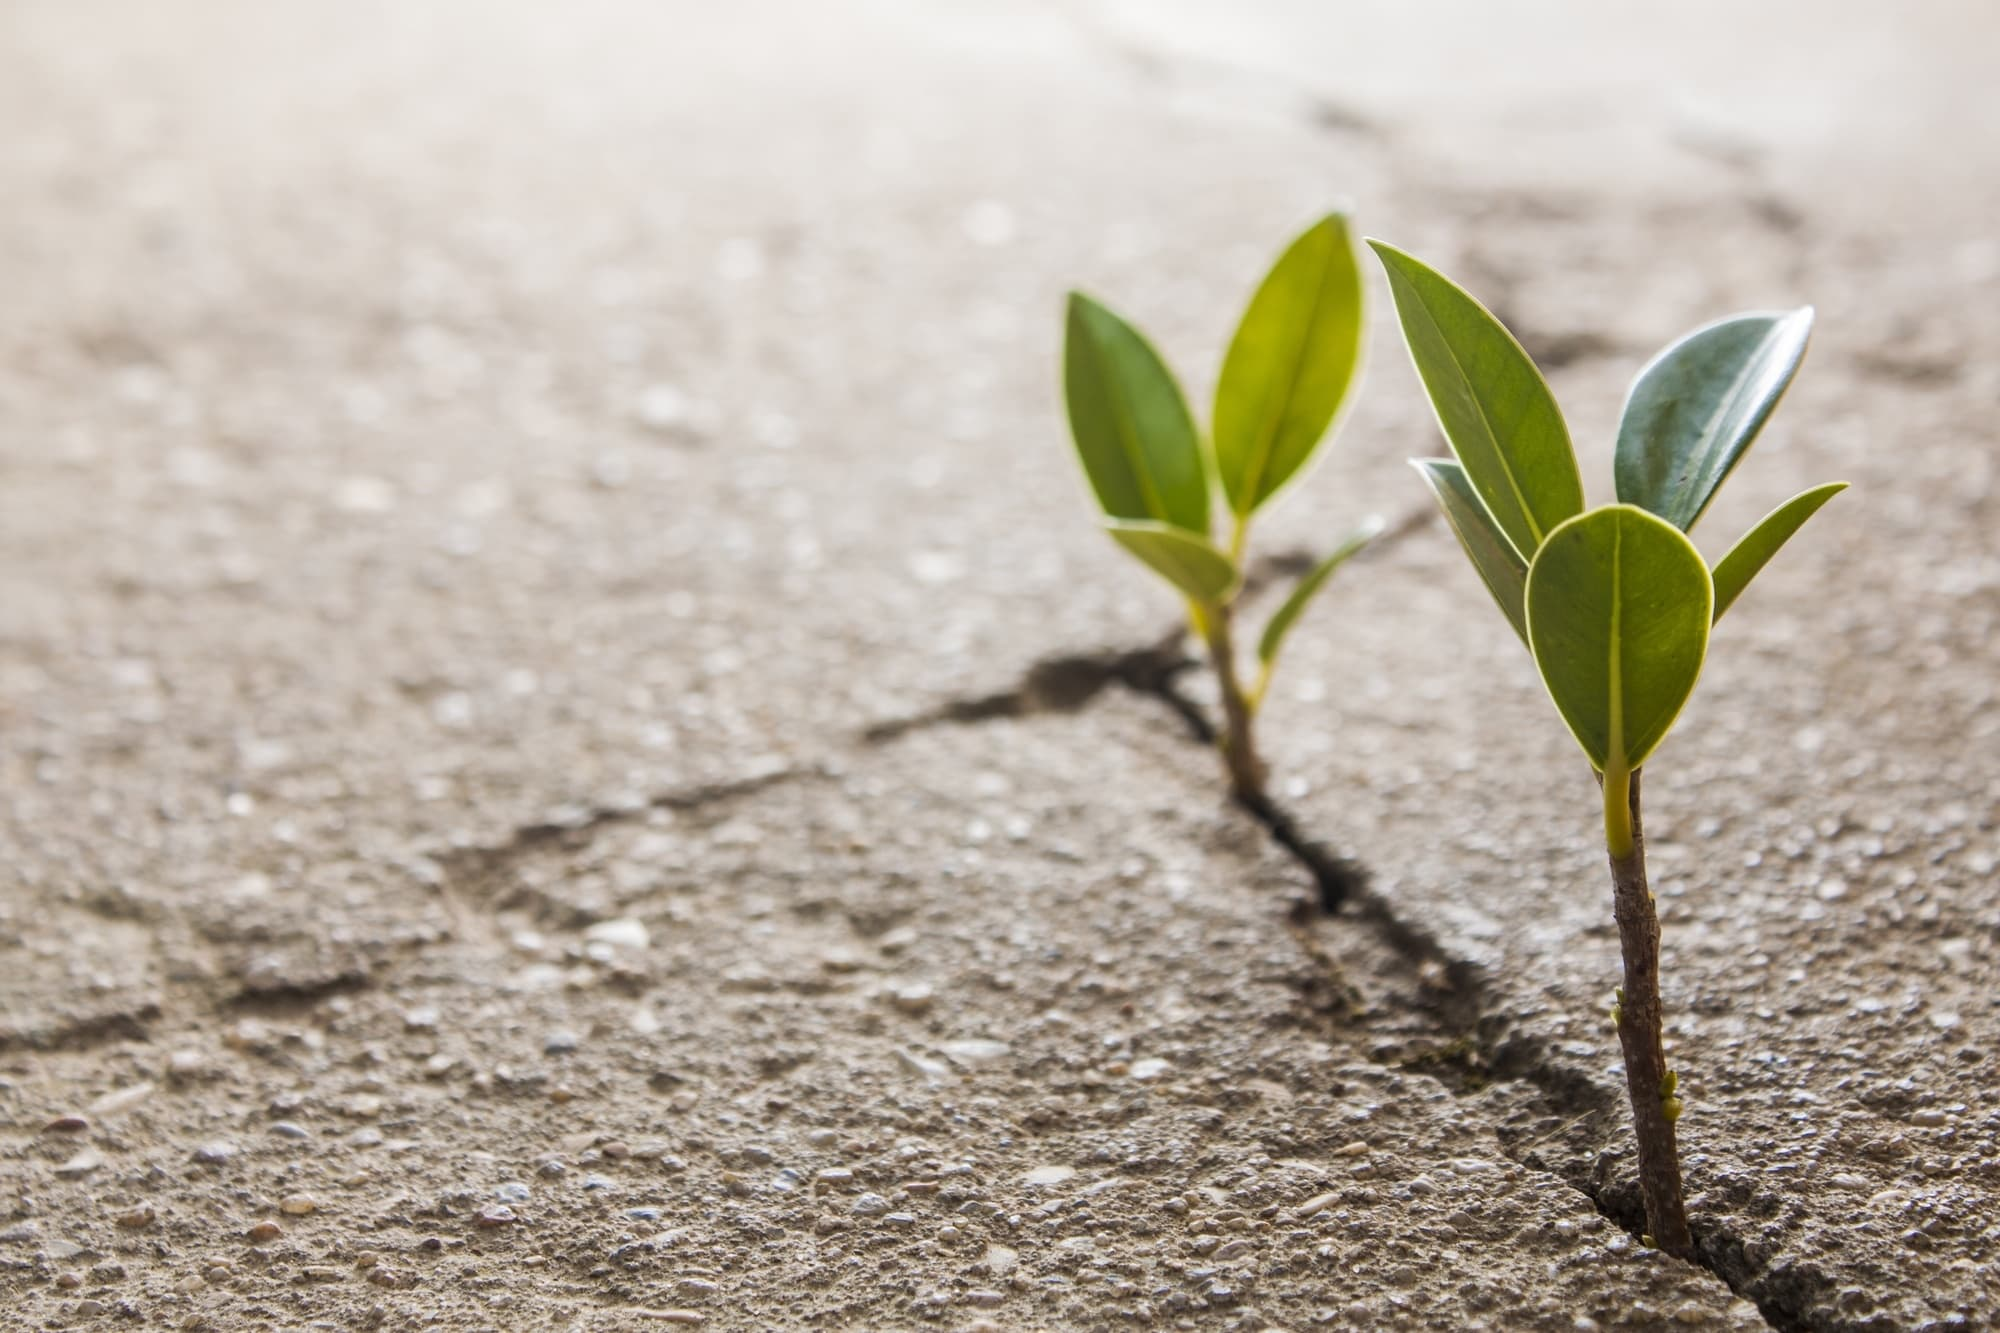 plants growing through cracks in asphalt